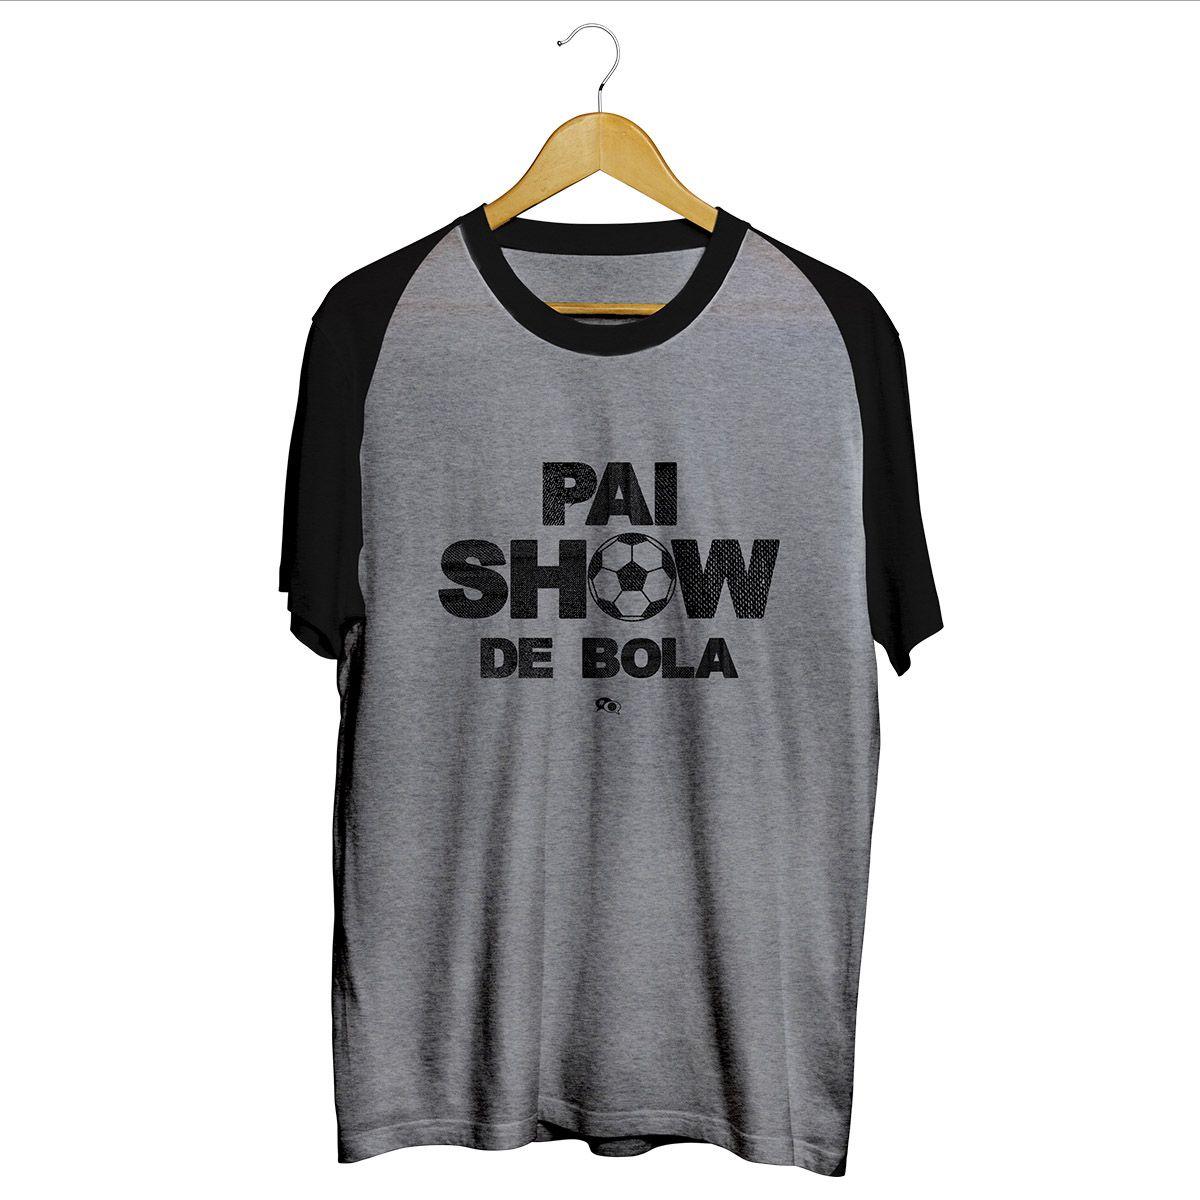 Camiseta - PAI SHOW DE BOLA. Masculino